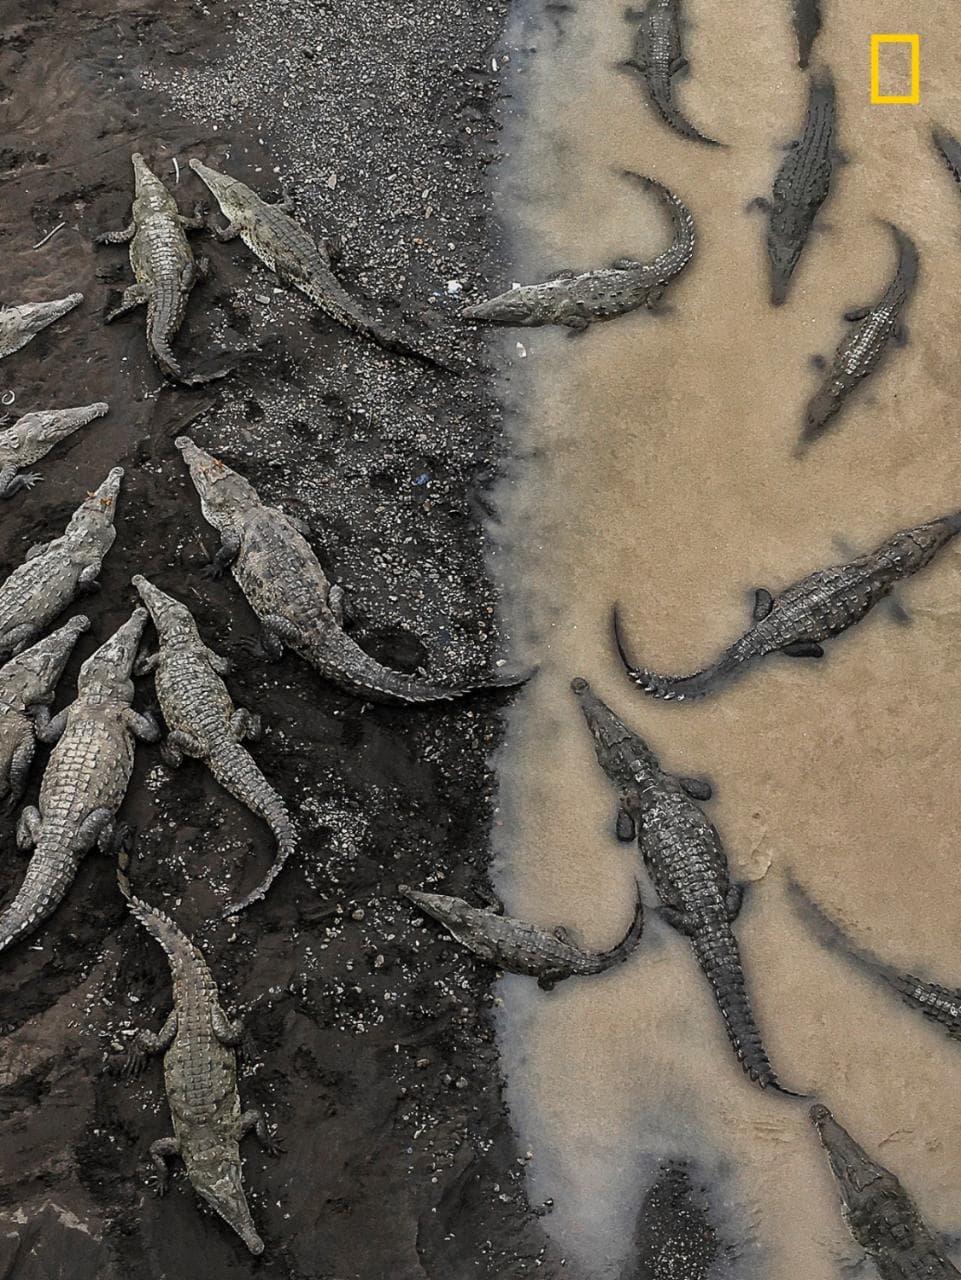 Категория «Природа», 3-е место — крокодилы в реке Тарколес. Фото: Tarun Sinha